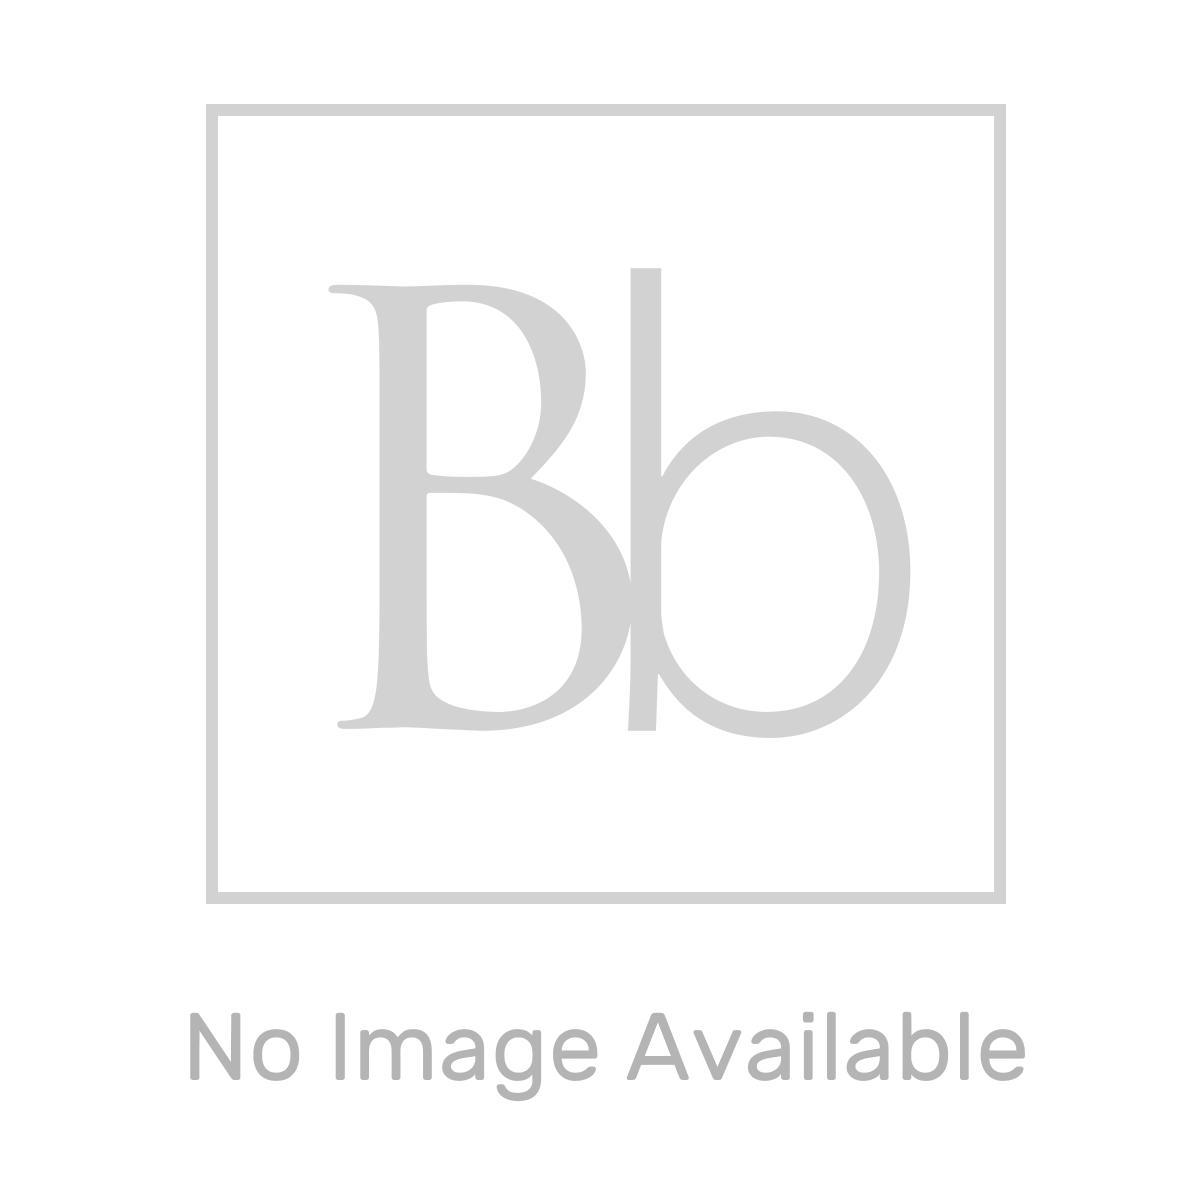 Left Hand Offset Quadrant Anti-Slip Shower 1200mm x 900mm Line Drawing